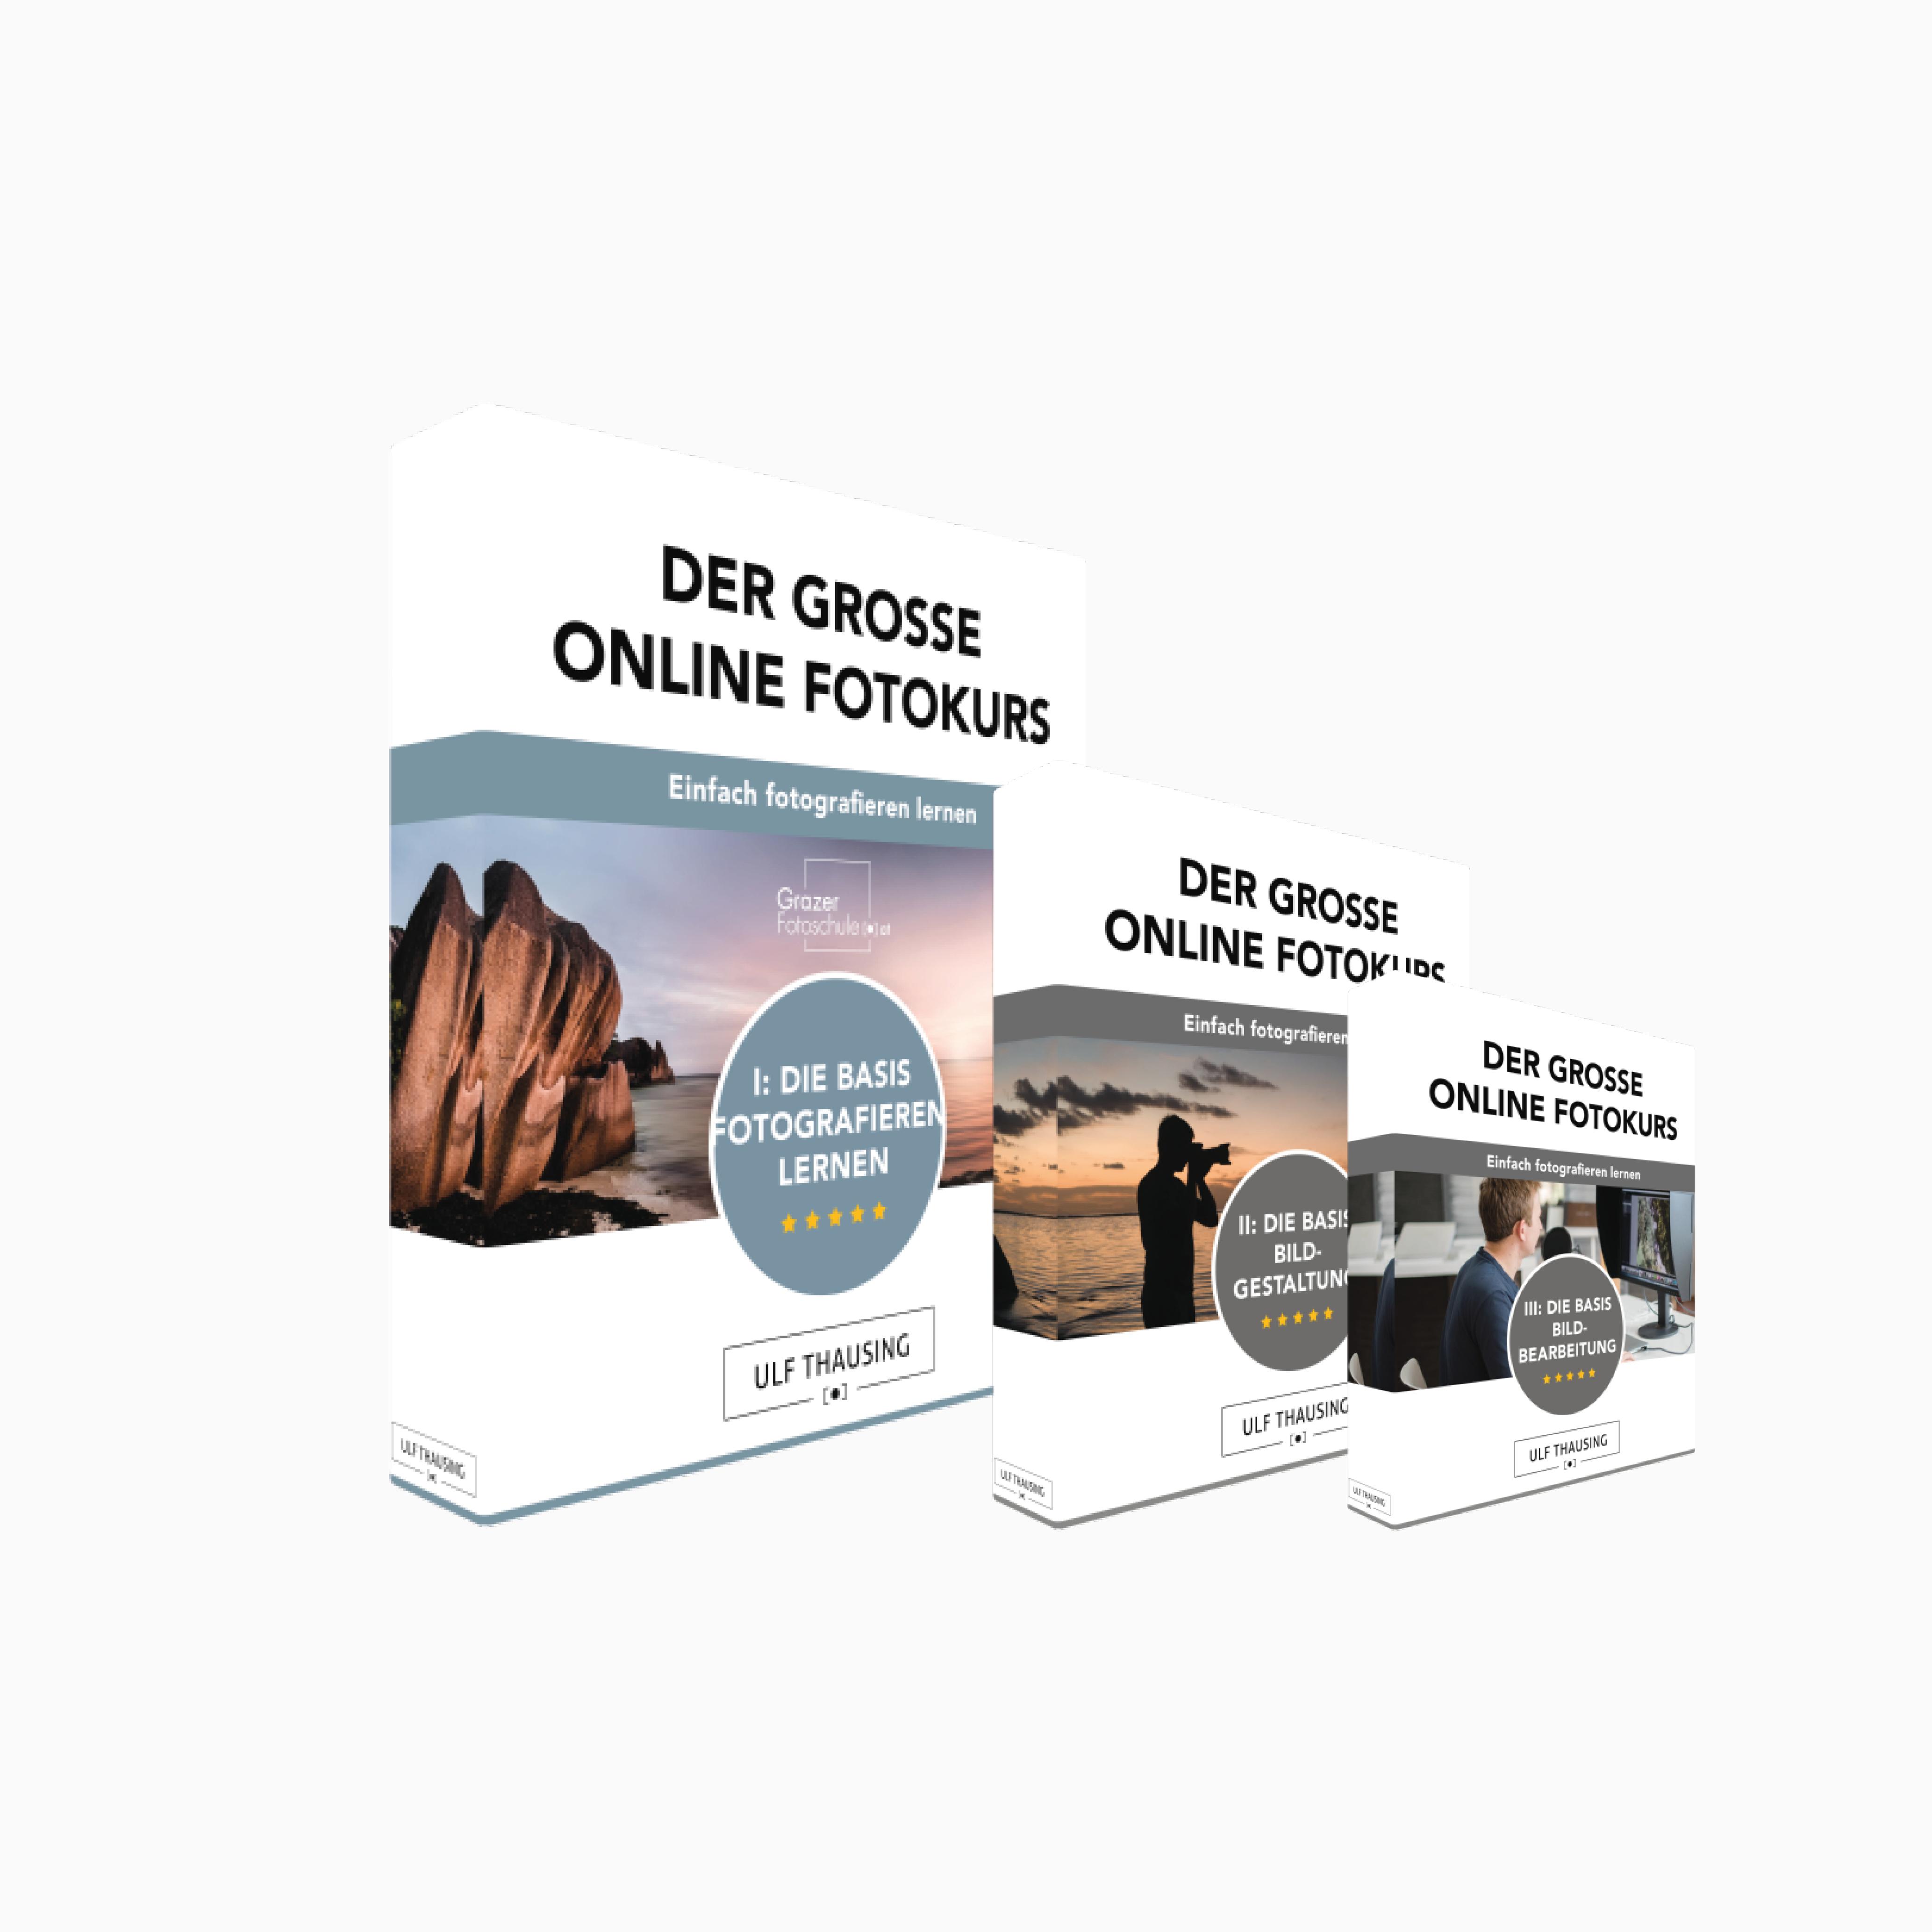 Fotokurs online gratis